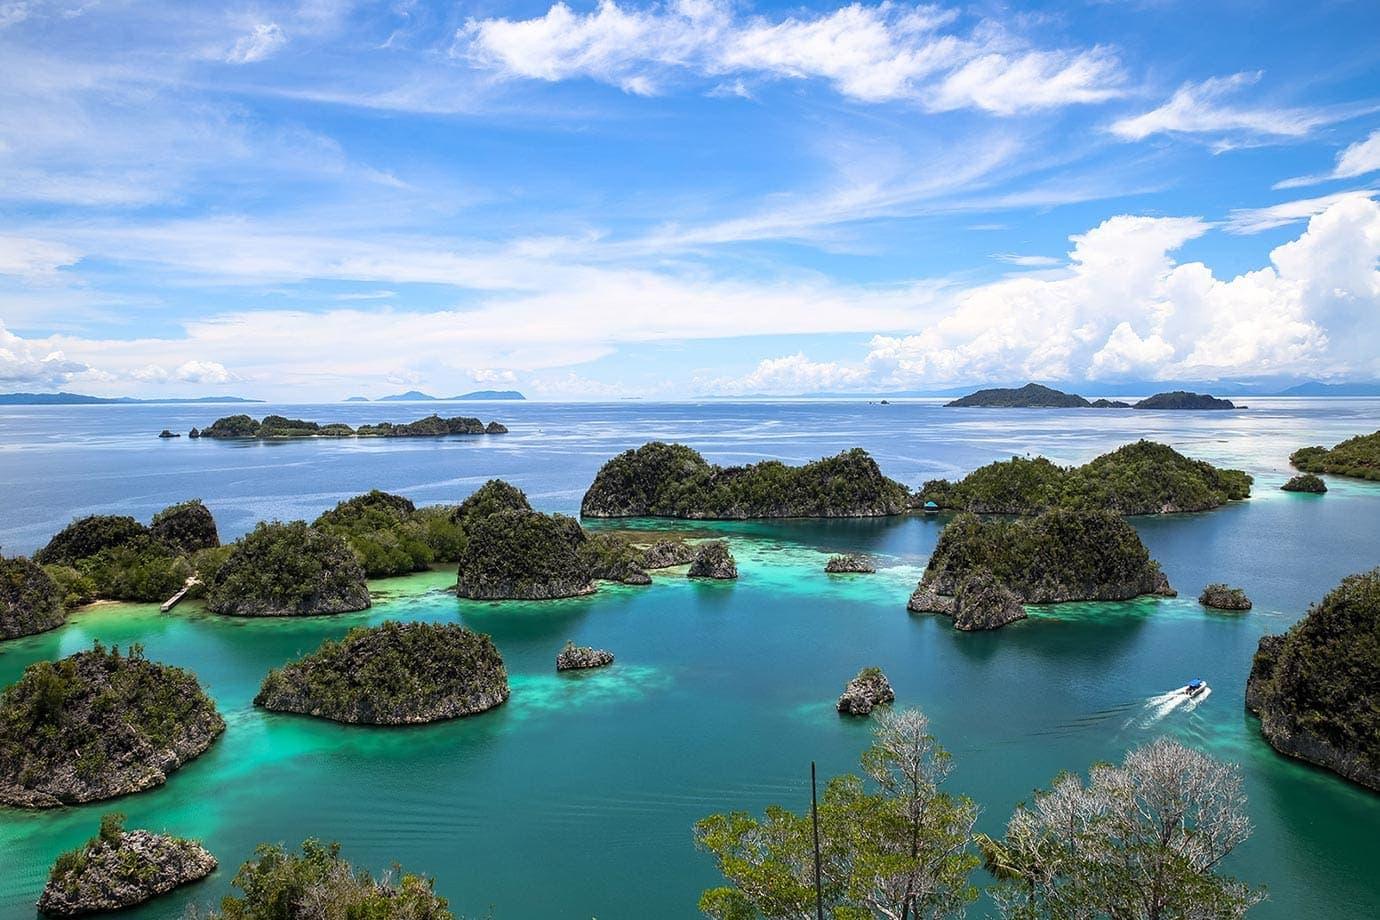 5 Tempat Wisata di Papua yang Terkenal, Pemandangan